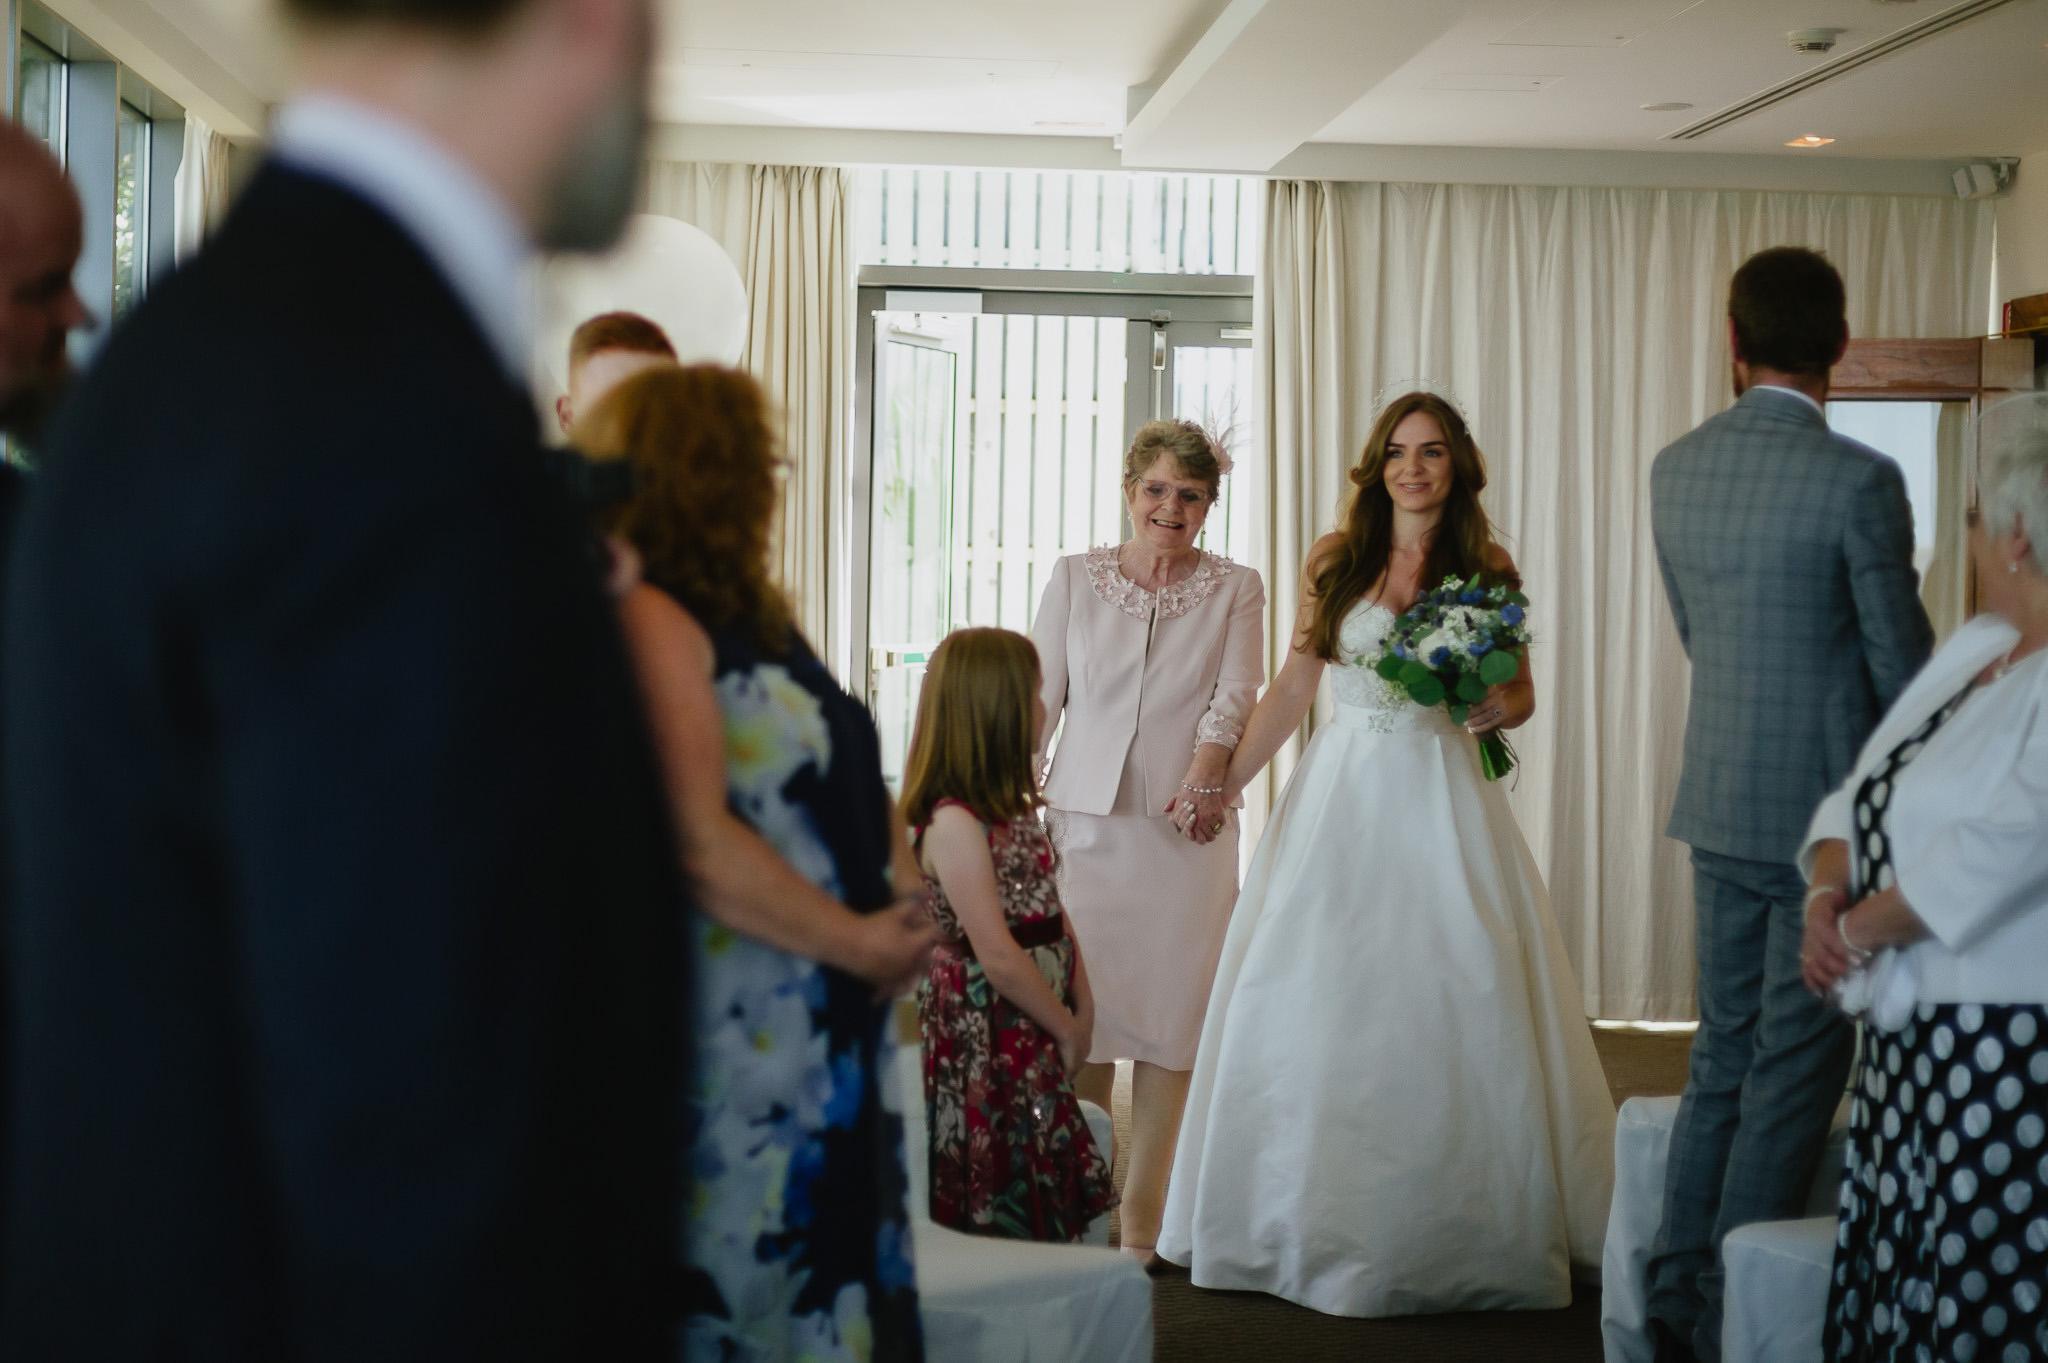 Cliff House Hotel Wedding Photographer Ireland-53.jpg